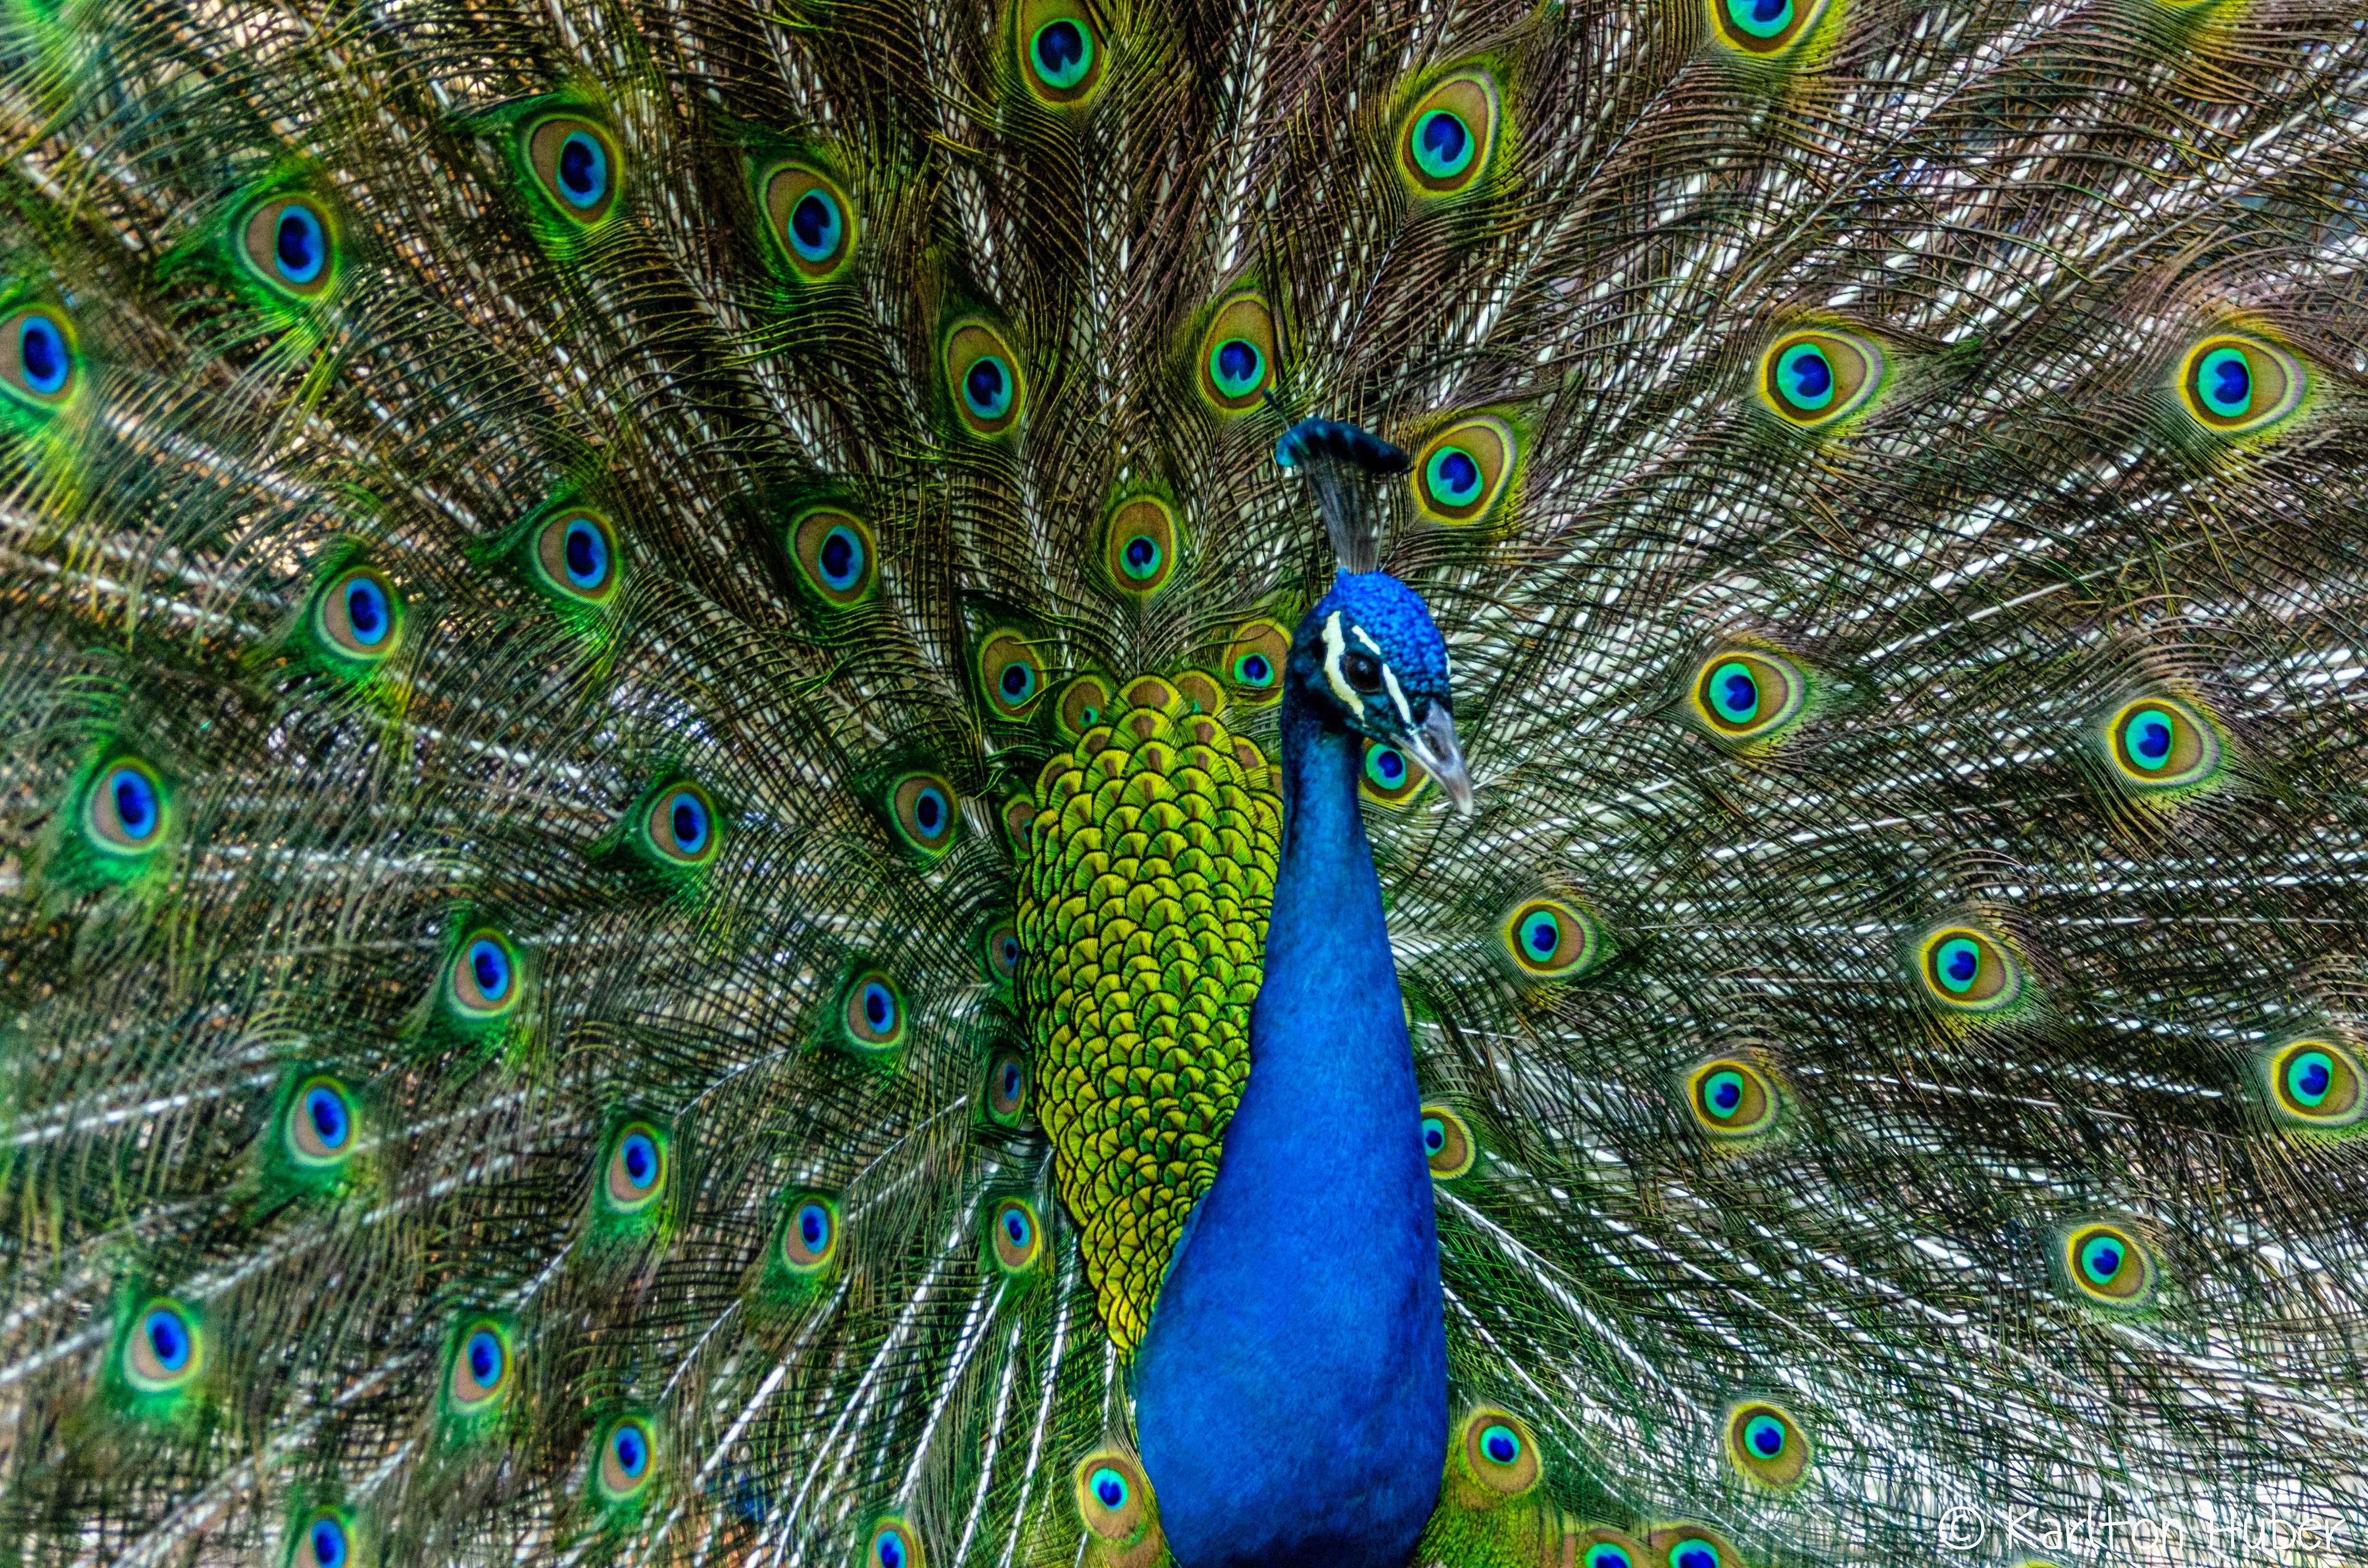 Peacock Courtship Display